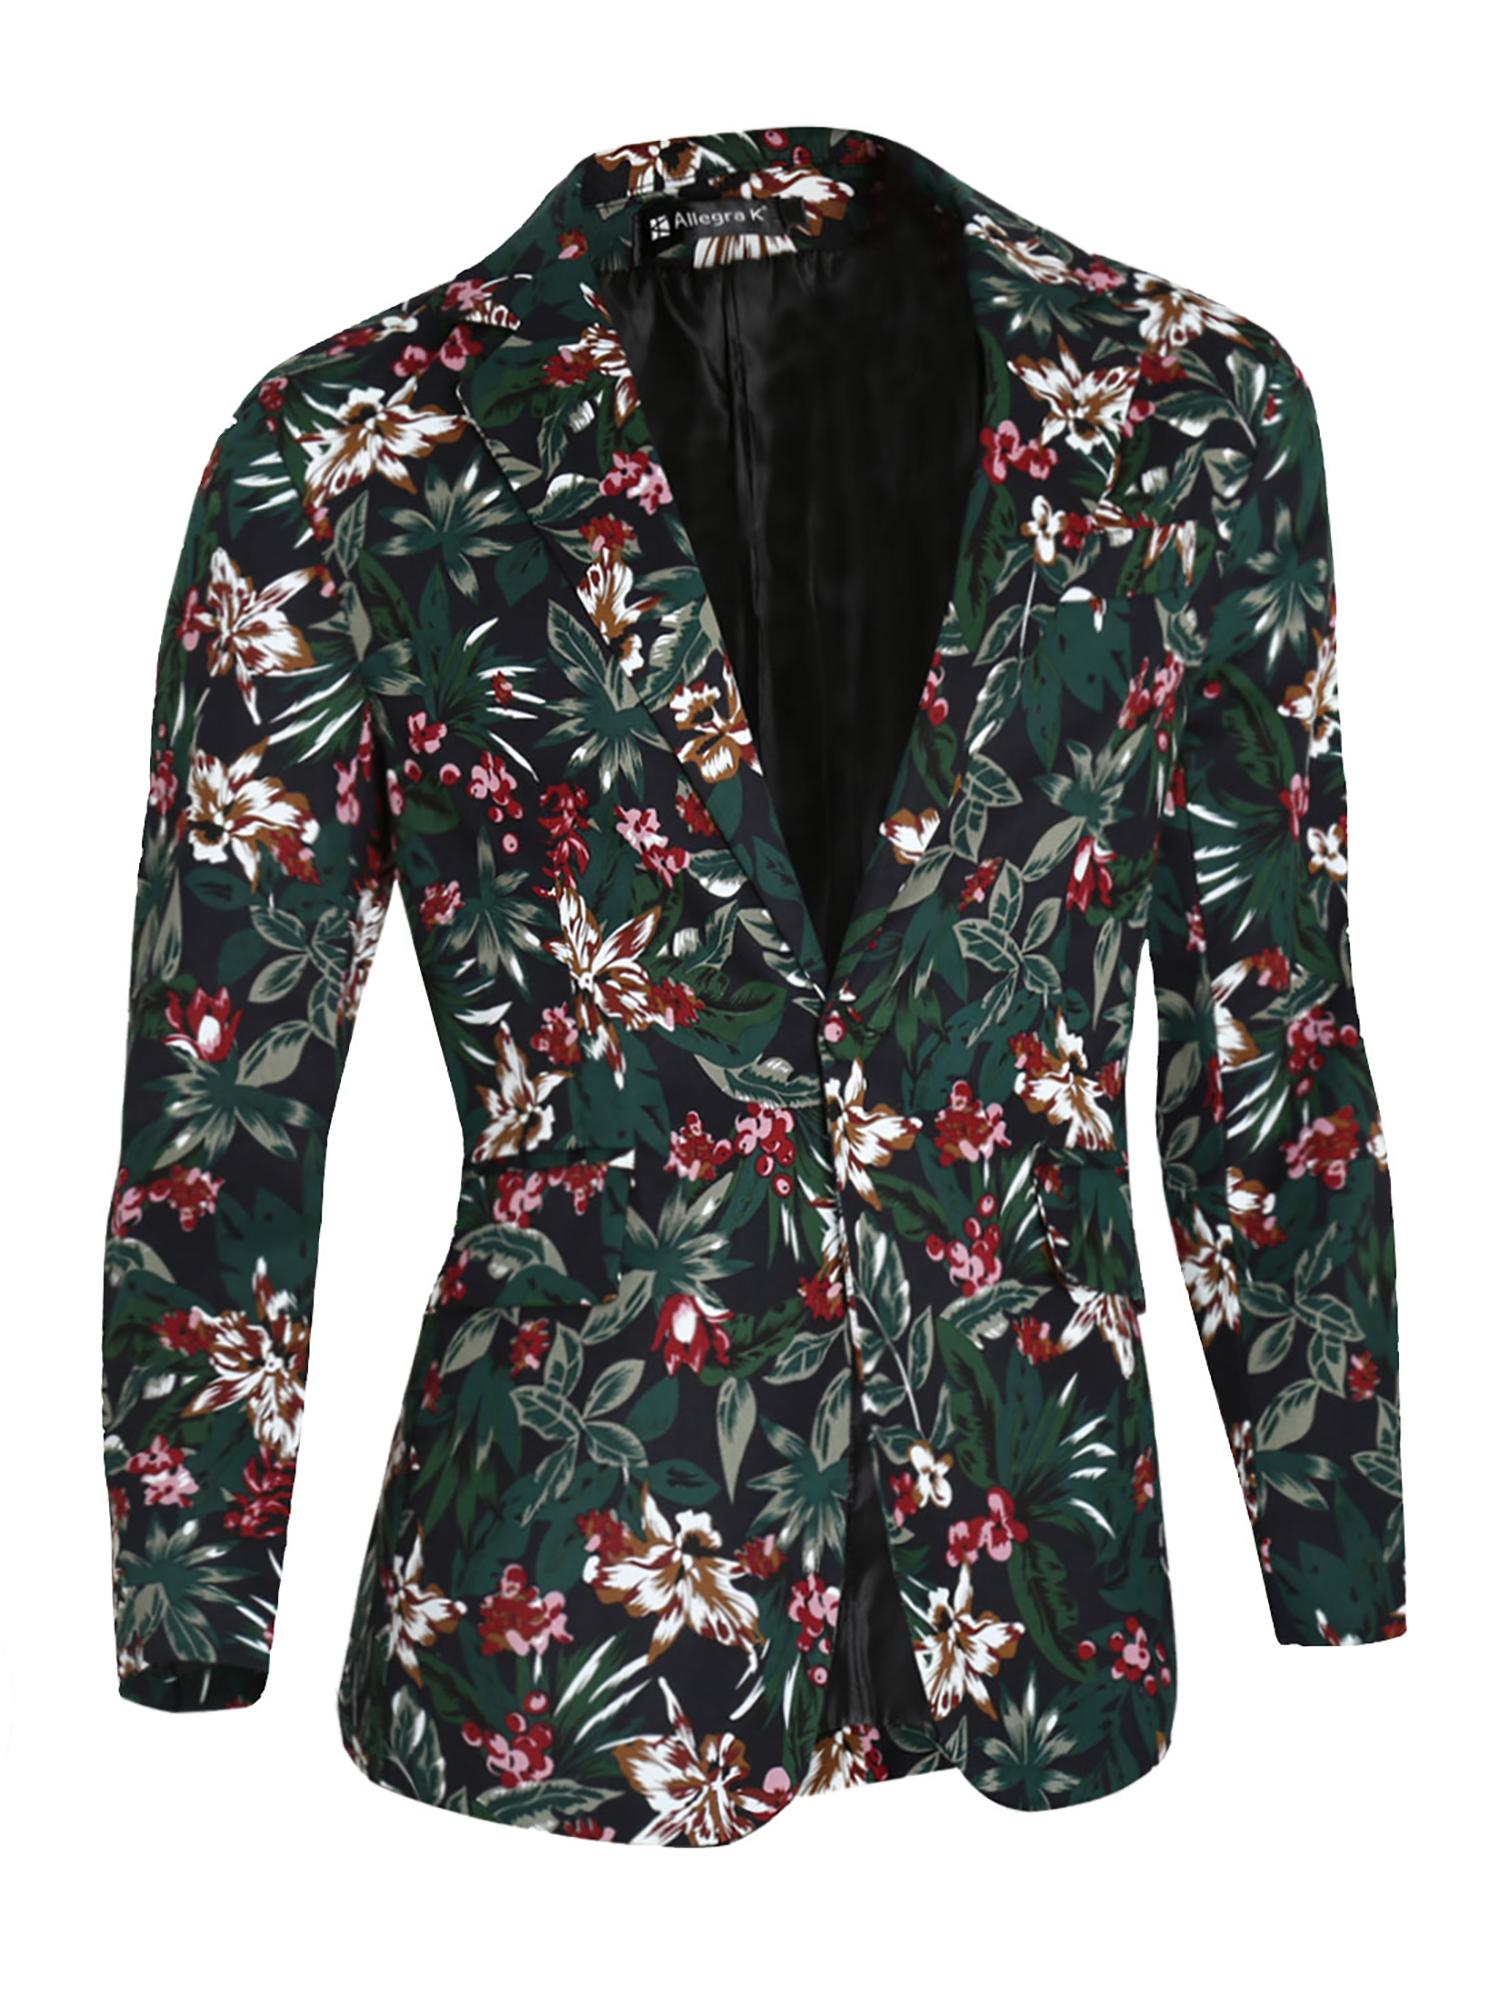 Azzuro Men's Floral Prints Notch Lapel Front Pockets Split Back Blazer Jacket (Size M / 40)